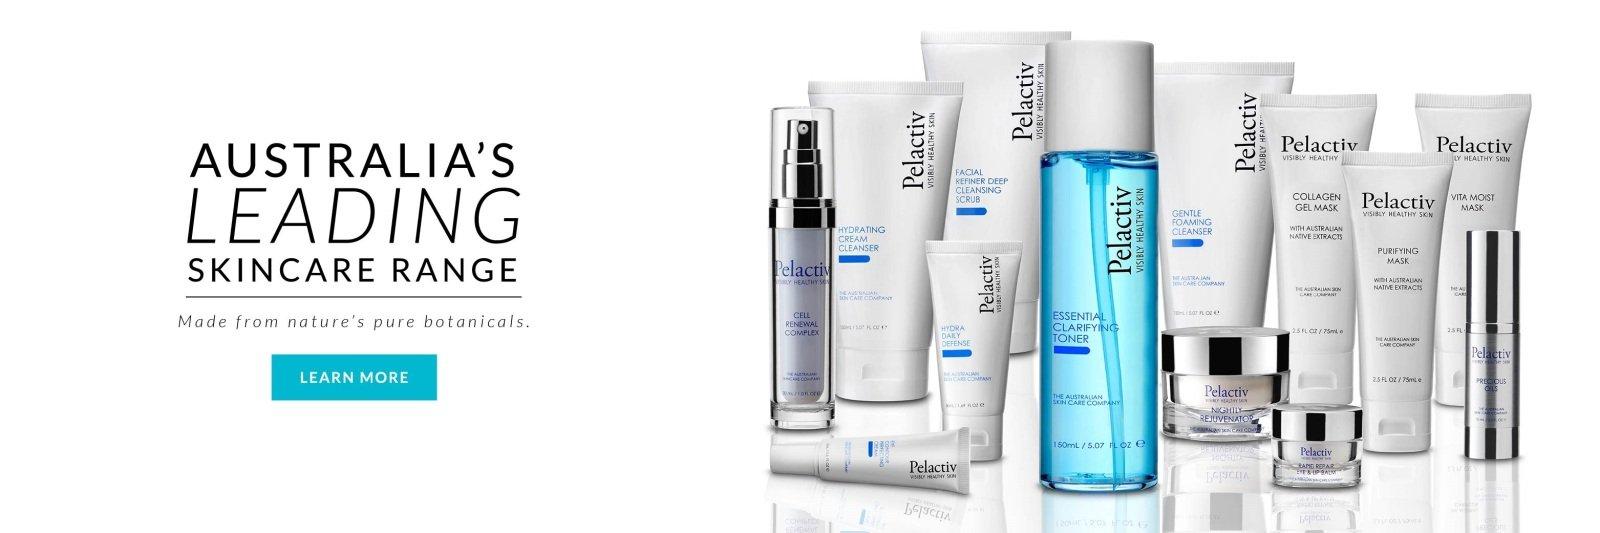 Pelactiv Visibly Healthy Skin